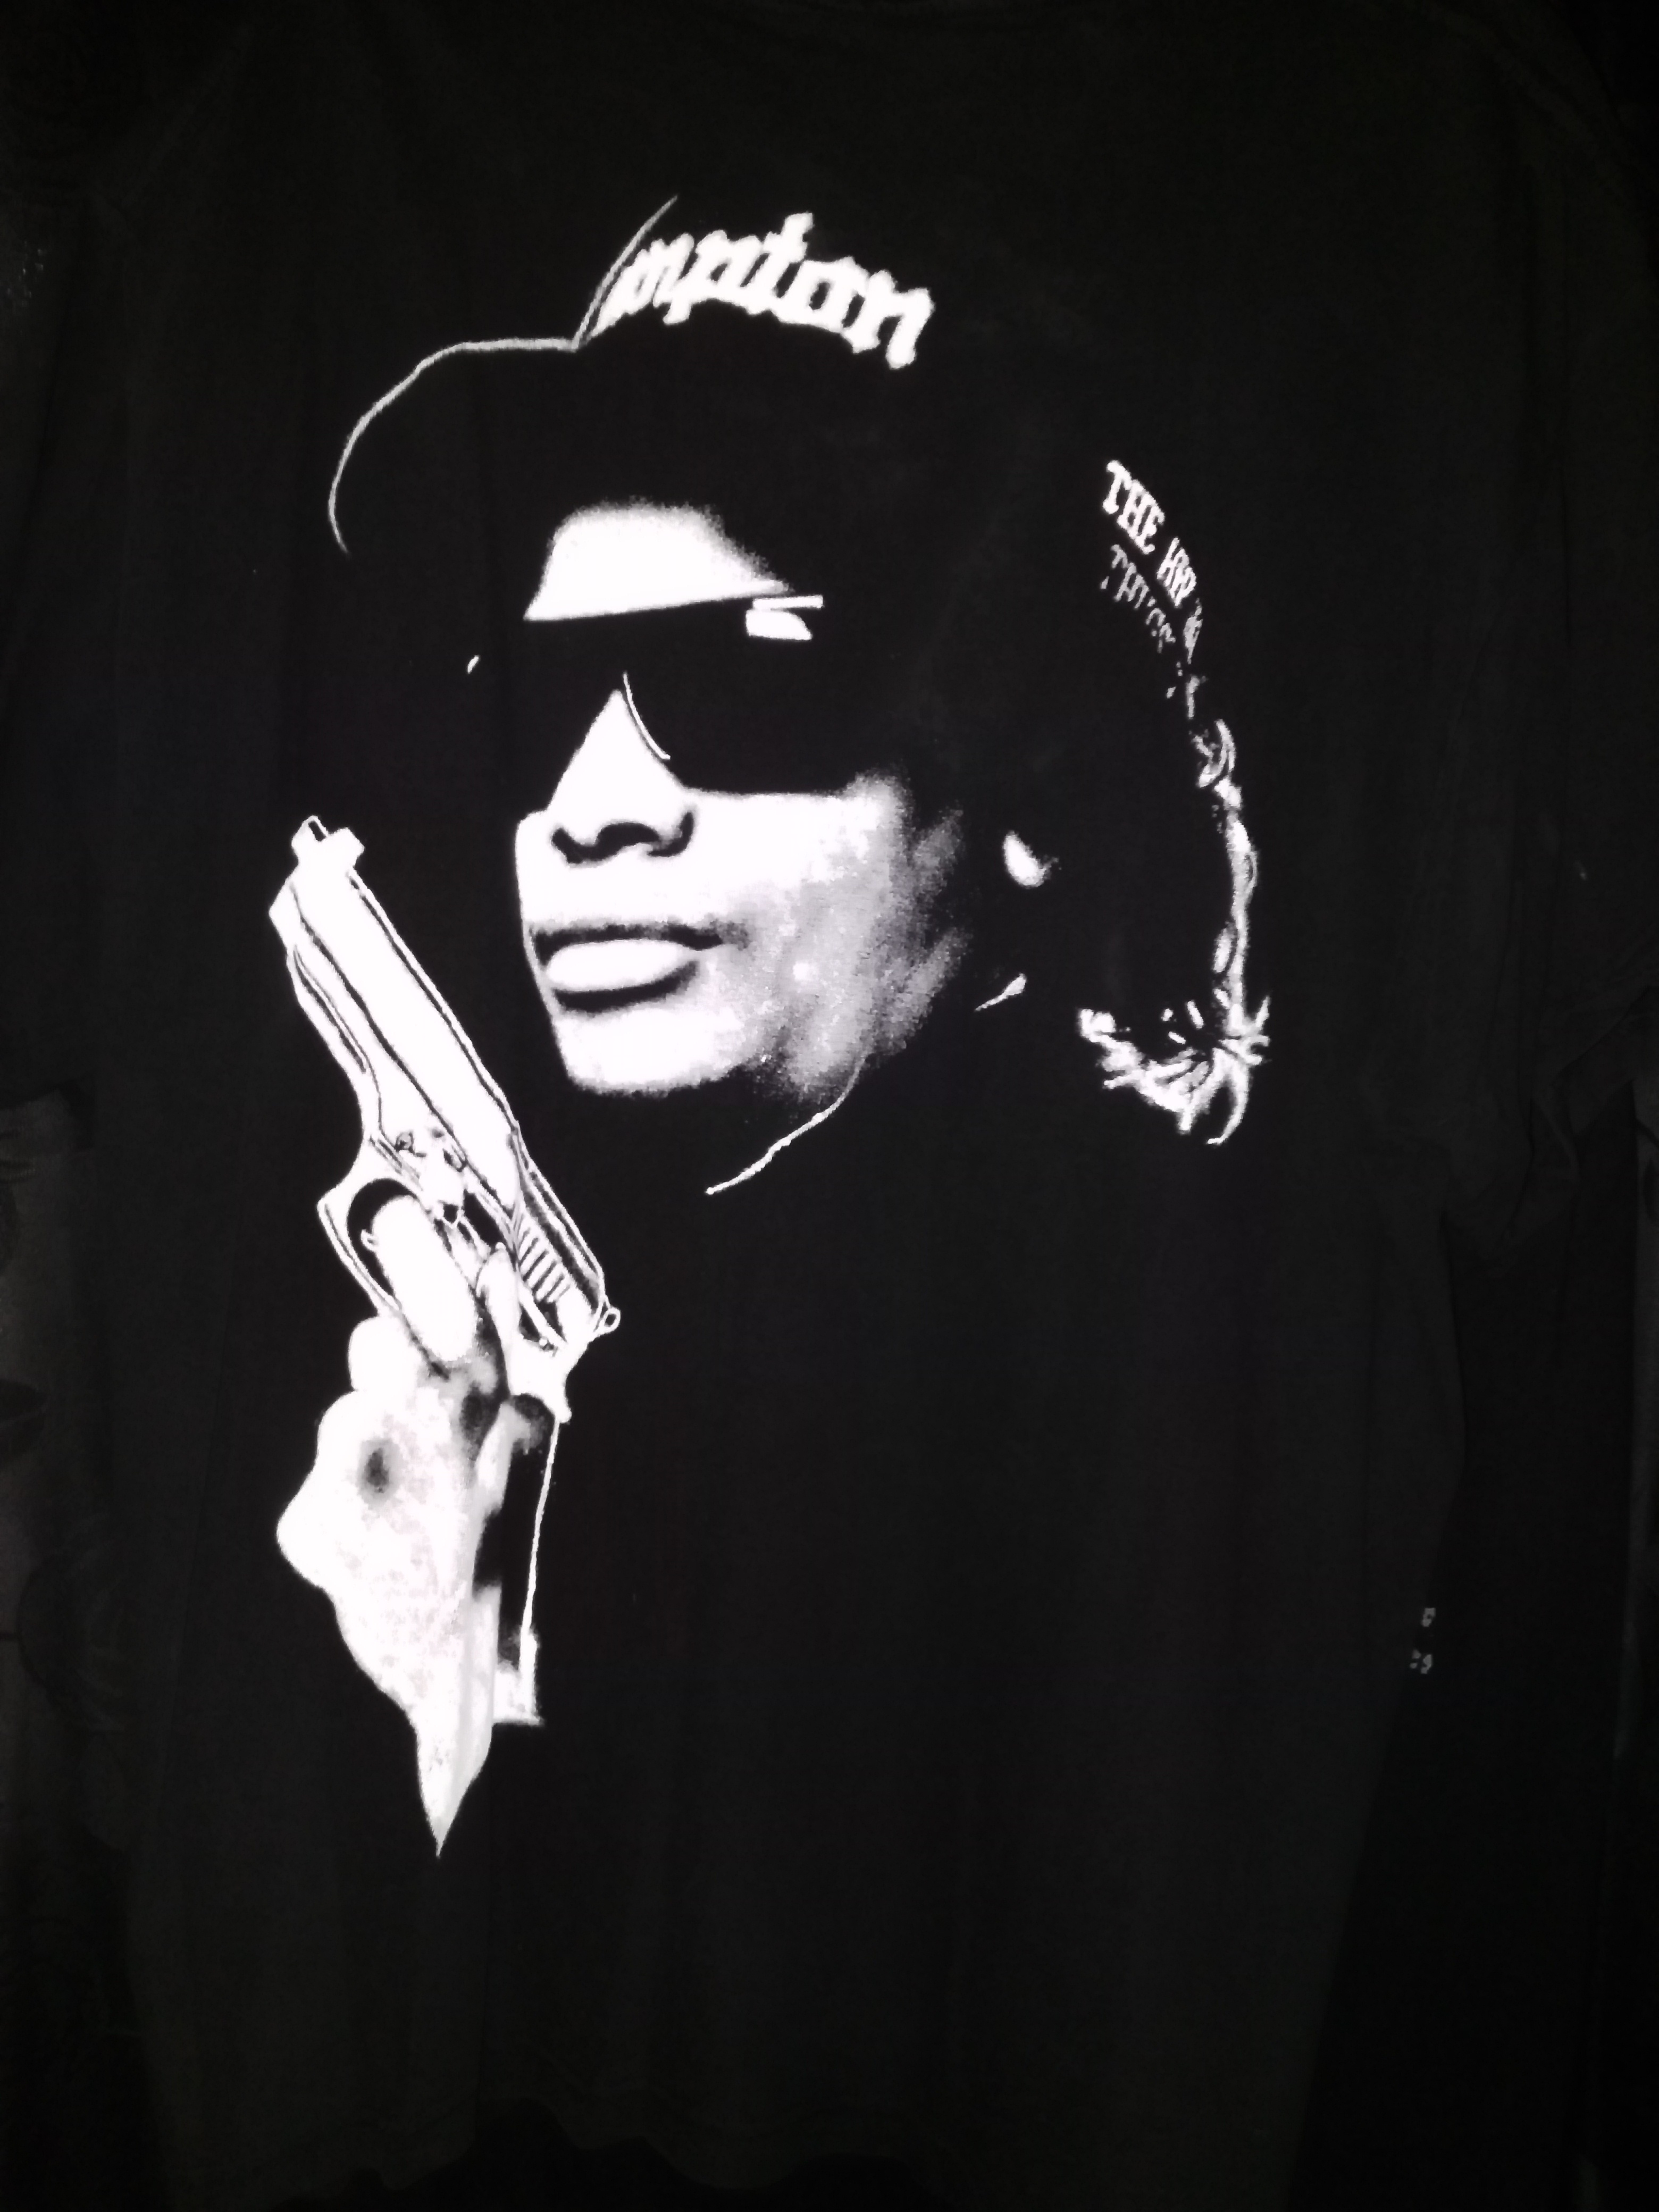 Eazy E 187 T Shirt Eazye187 Wallpaper 40197512 Fanpop